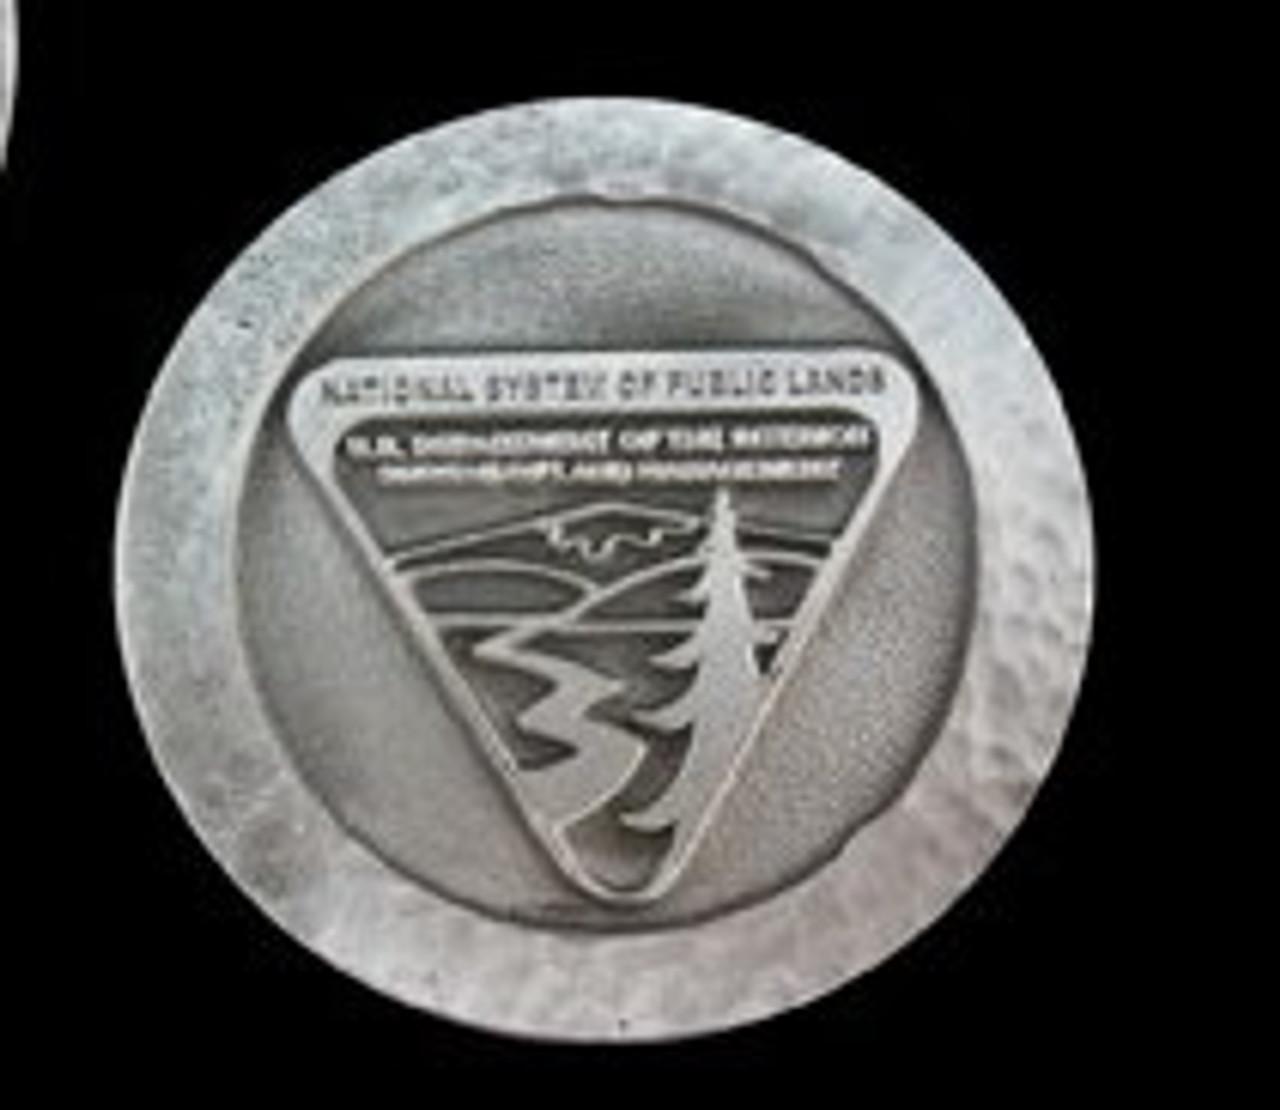 Bureau of Land Management Volunteer Appreciation Coin